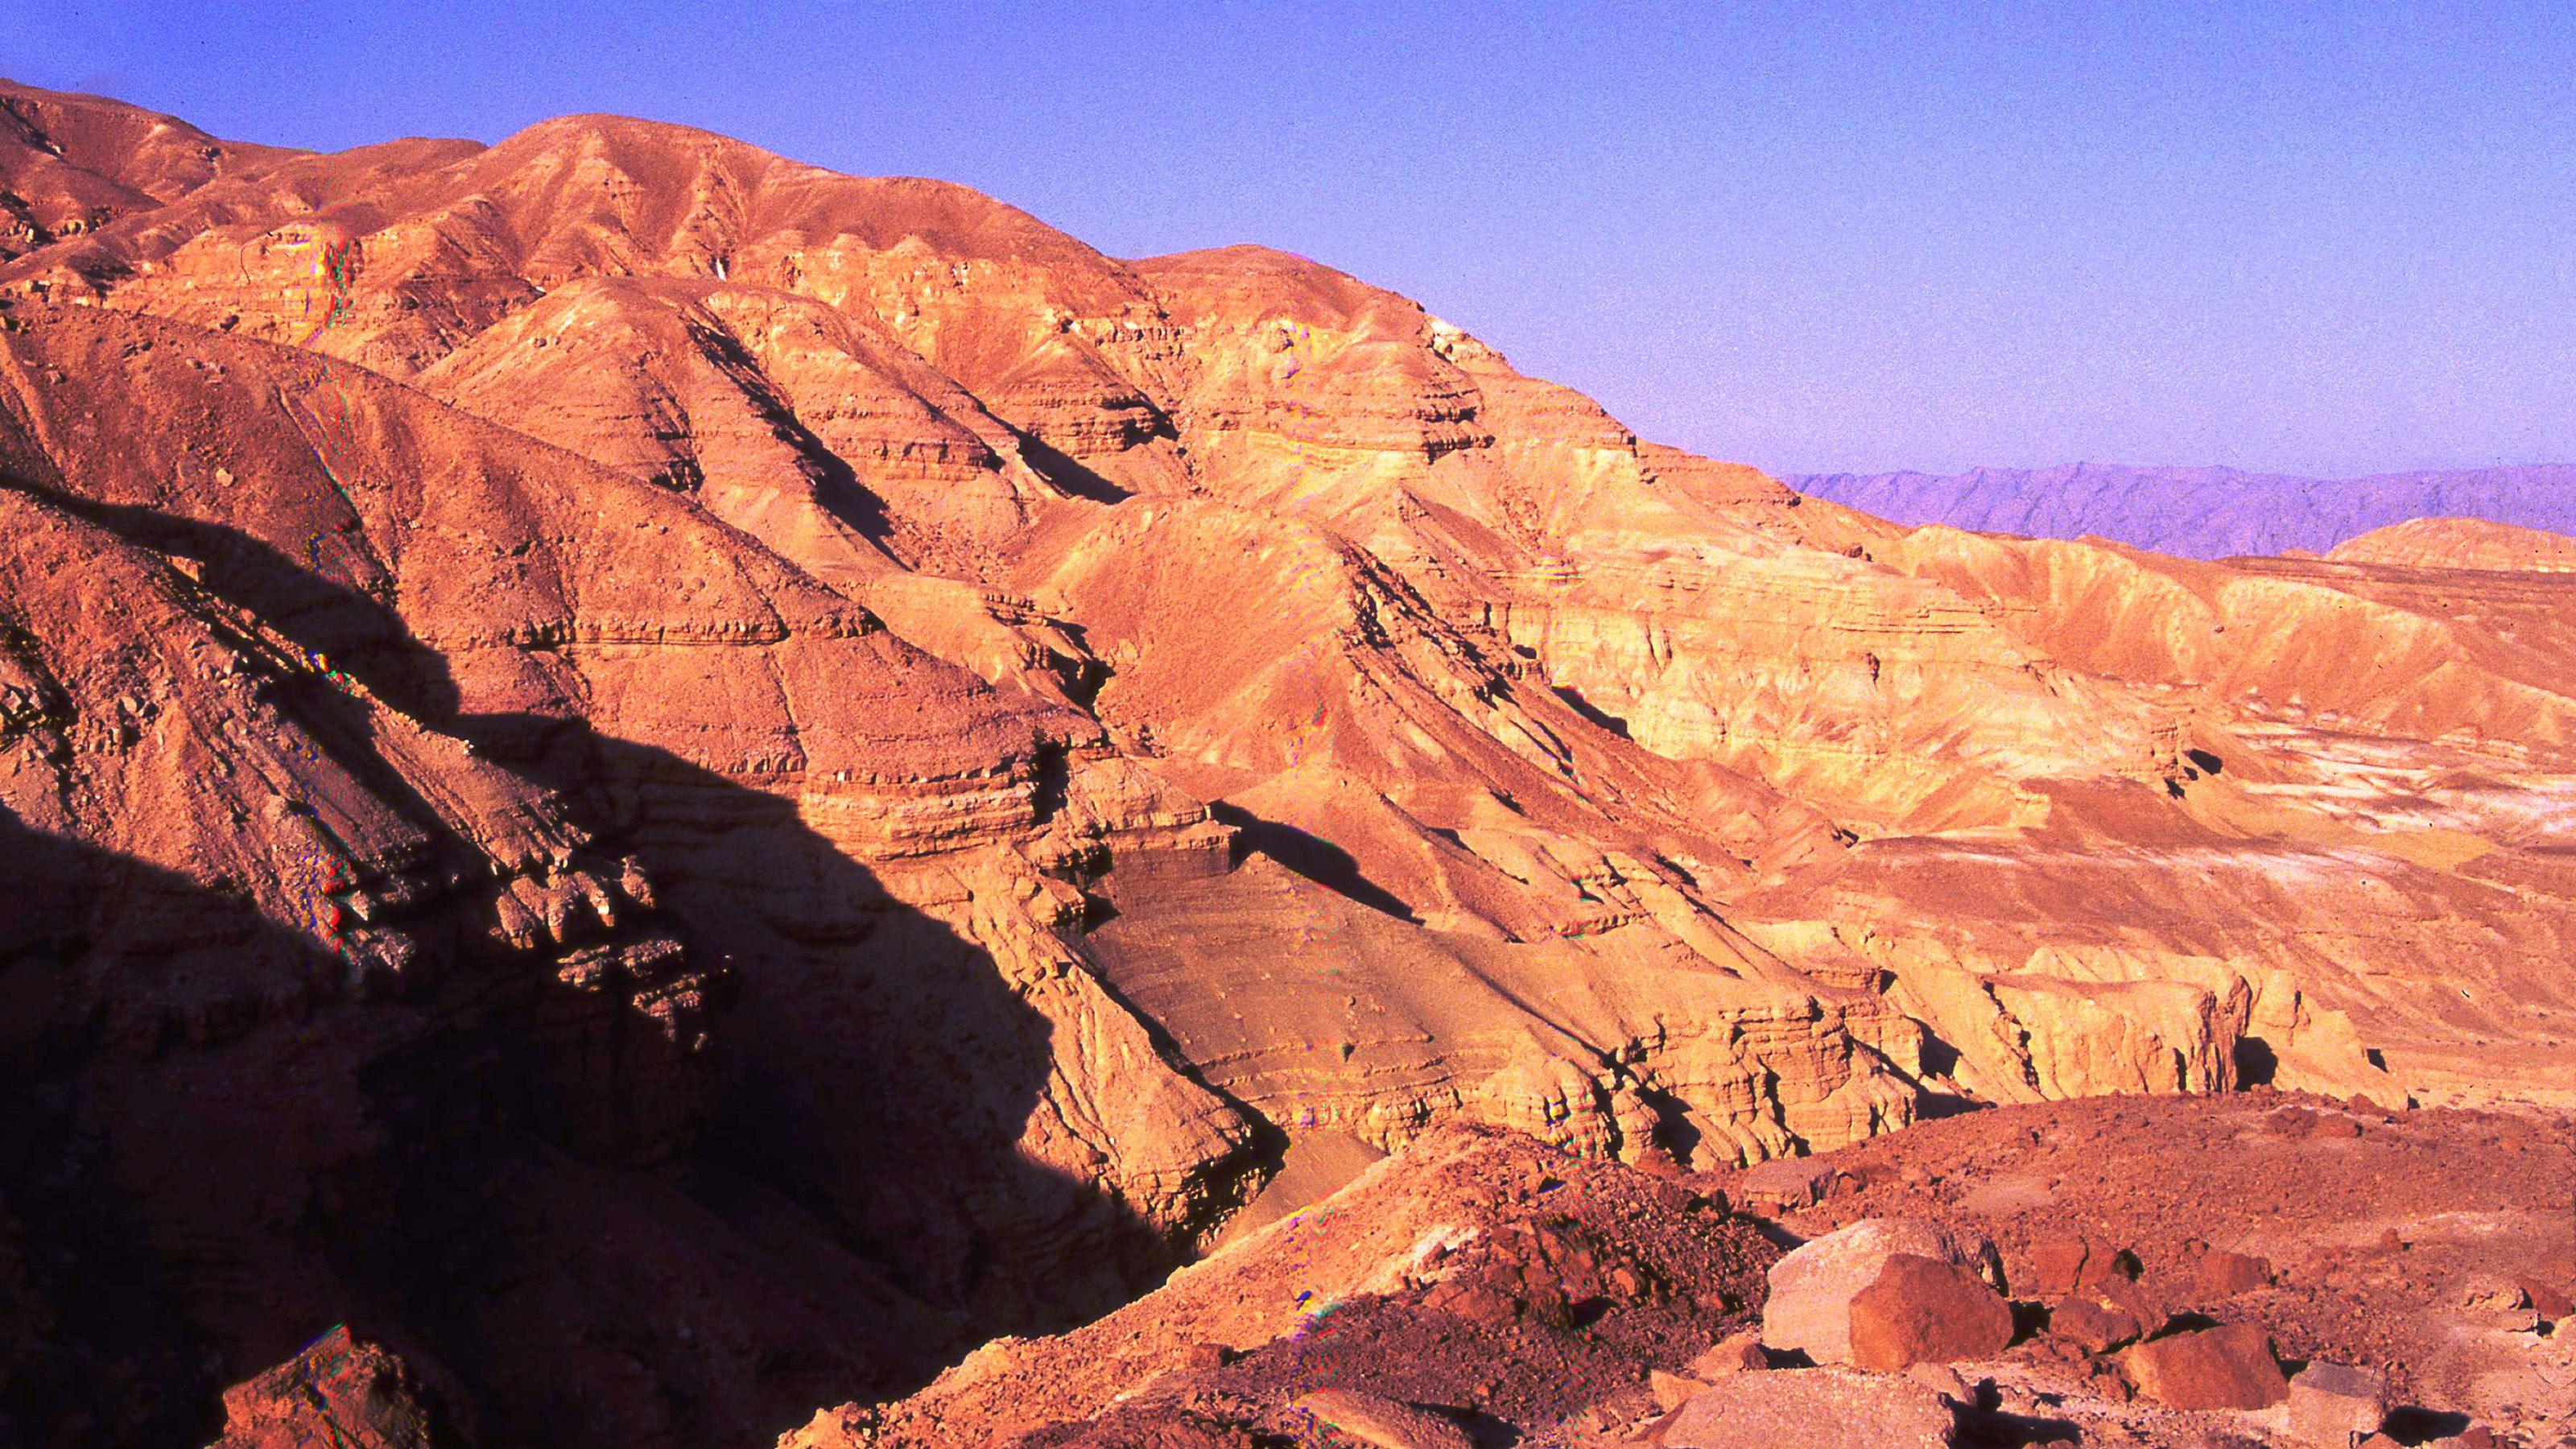 Desert mountains in Jericho